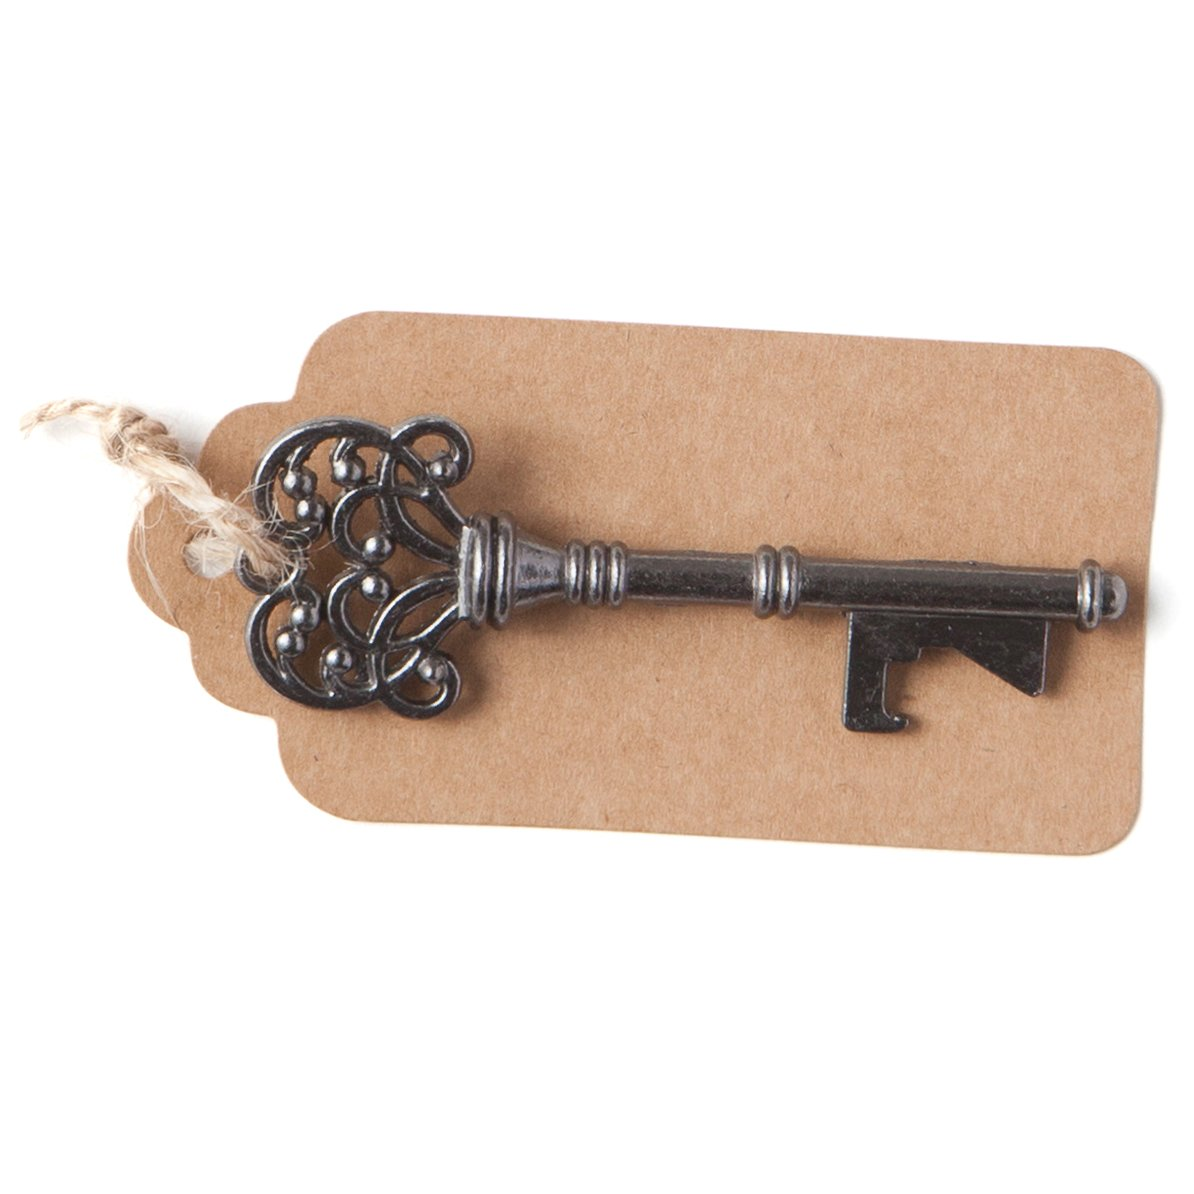 50 Key Bottle Openers w// Tags Twine Charcoal Gray Vintage Skeleton Keys Trinity